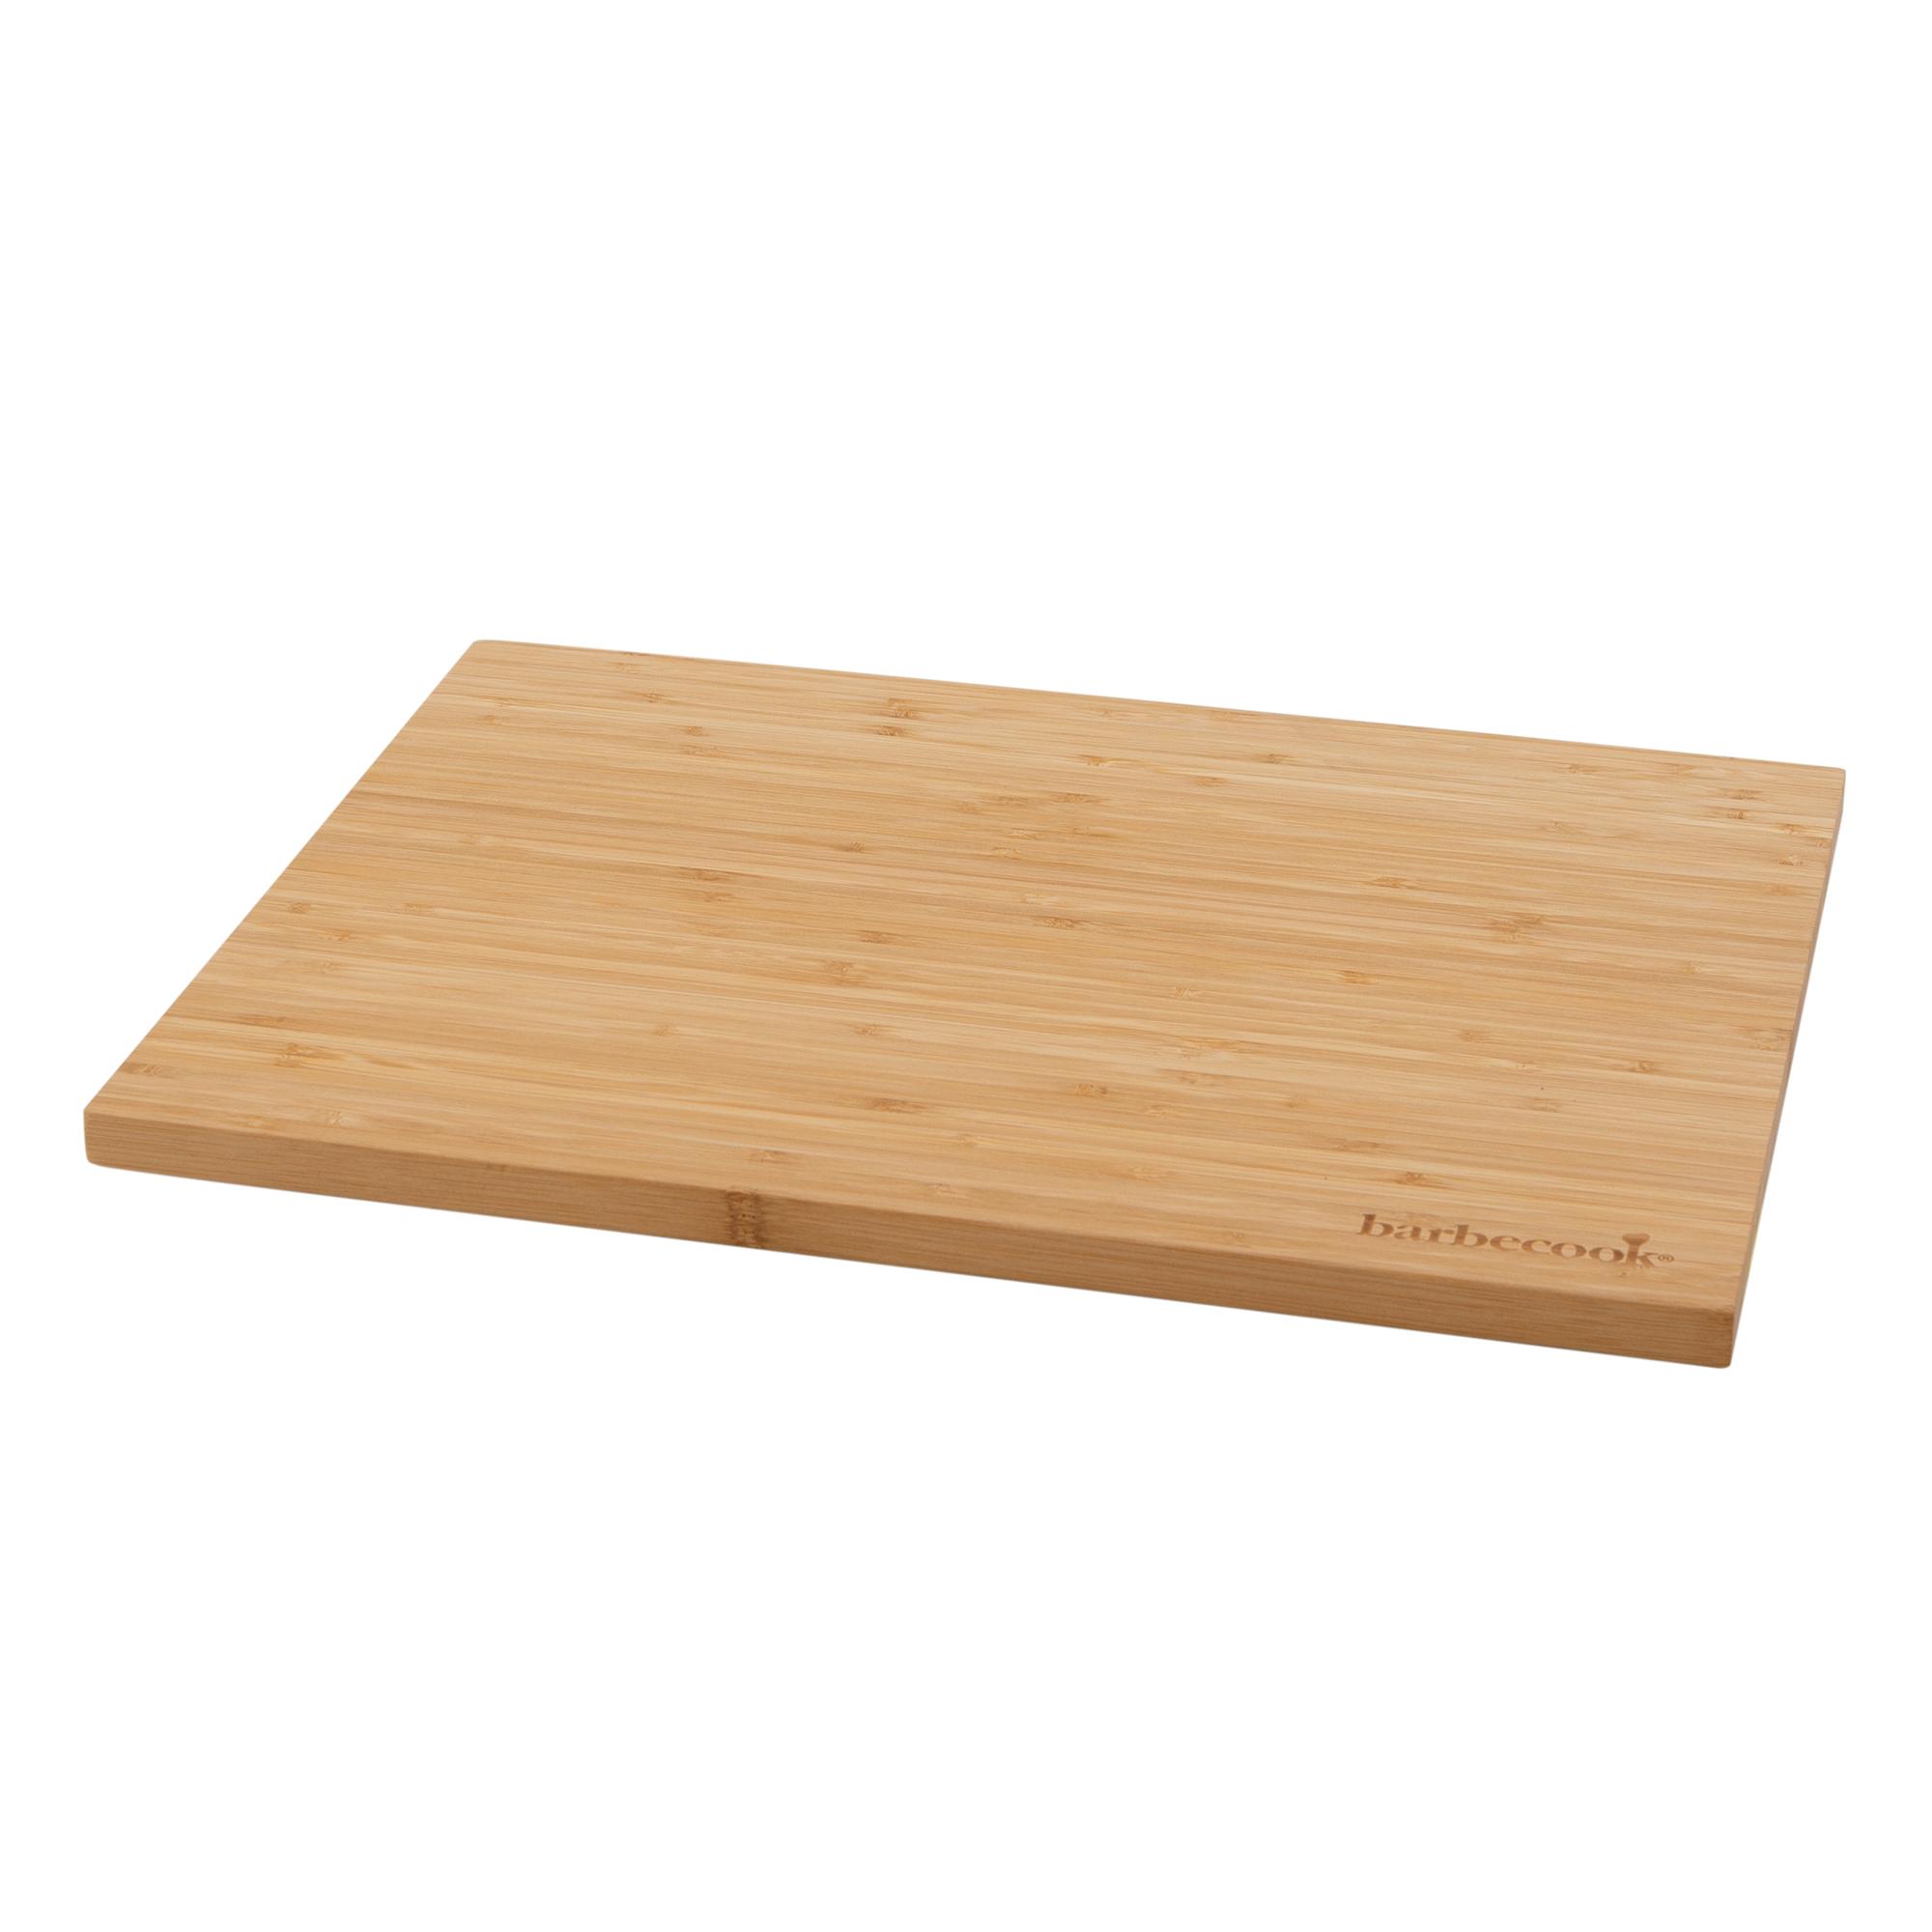 Barbecook bamboo cutting board 40x30x1.5cm